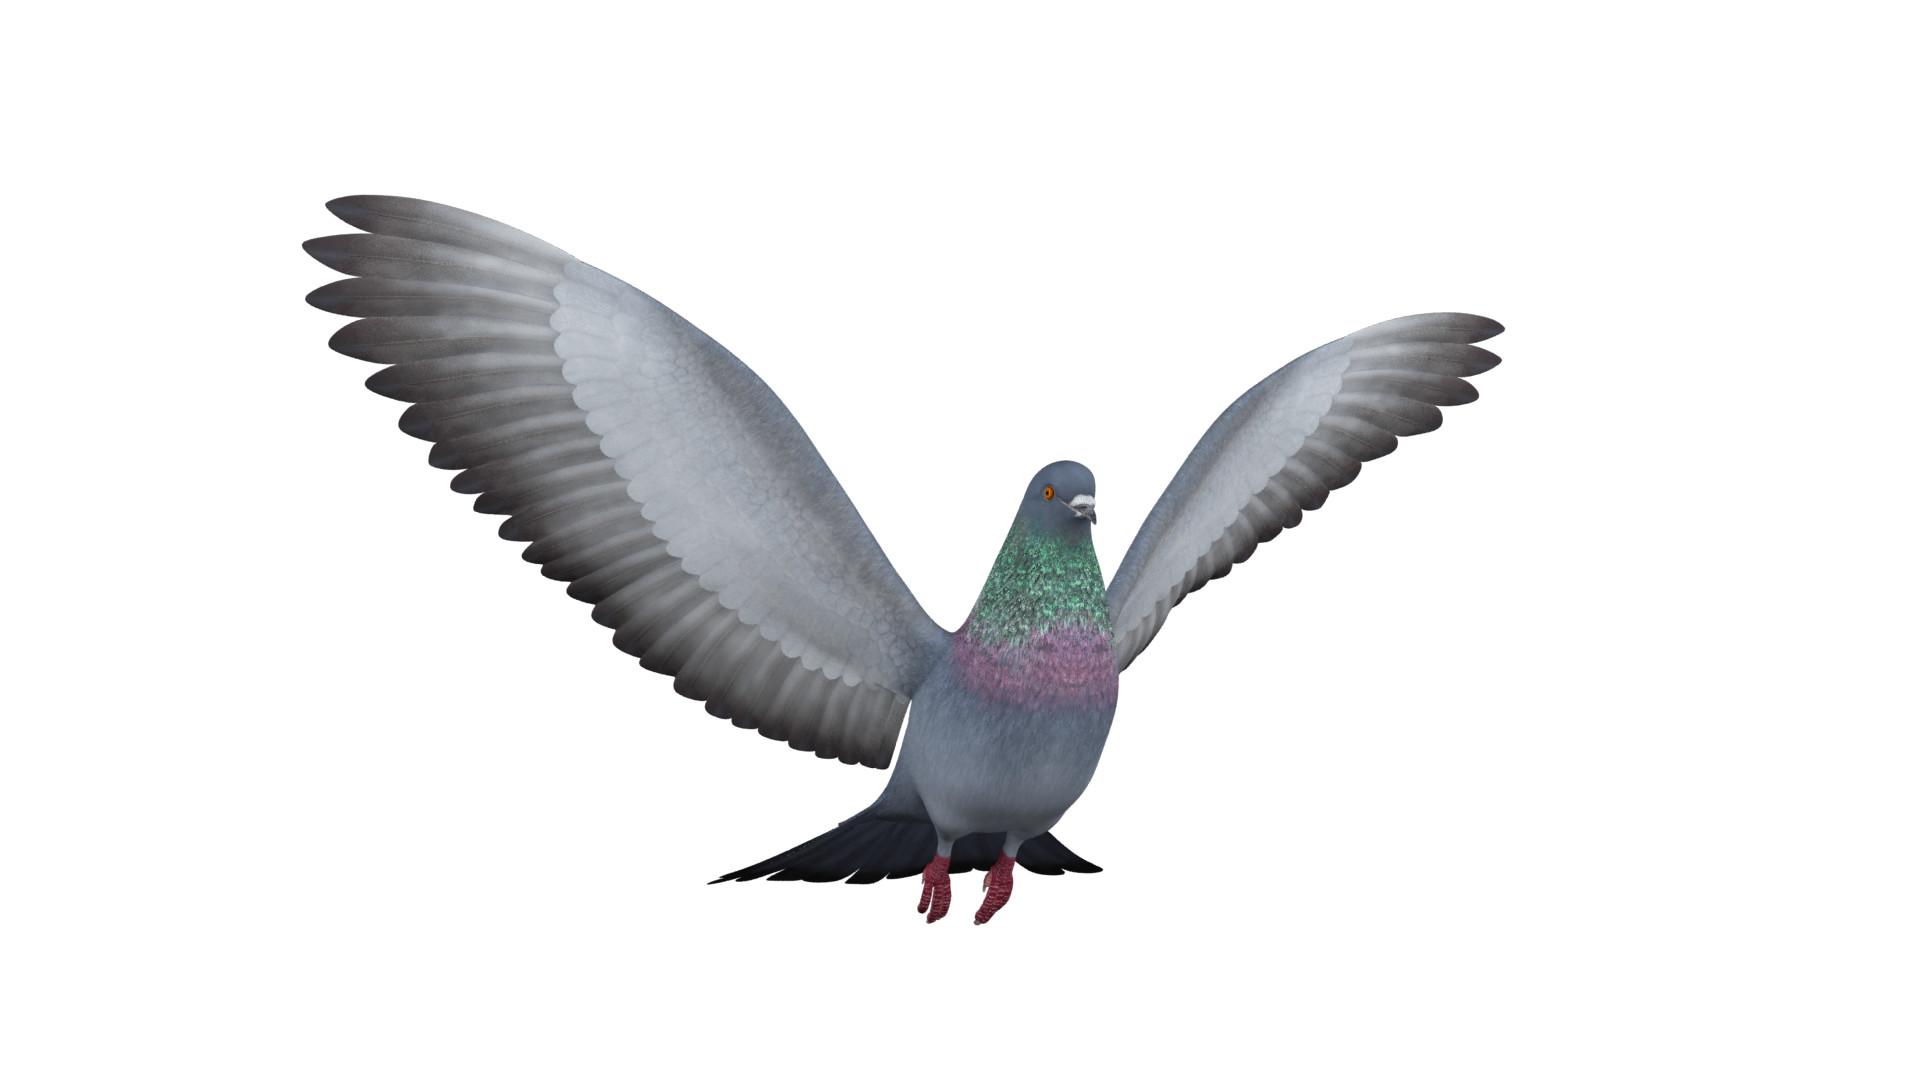 Alan kichl pigeon0979